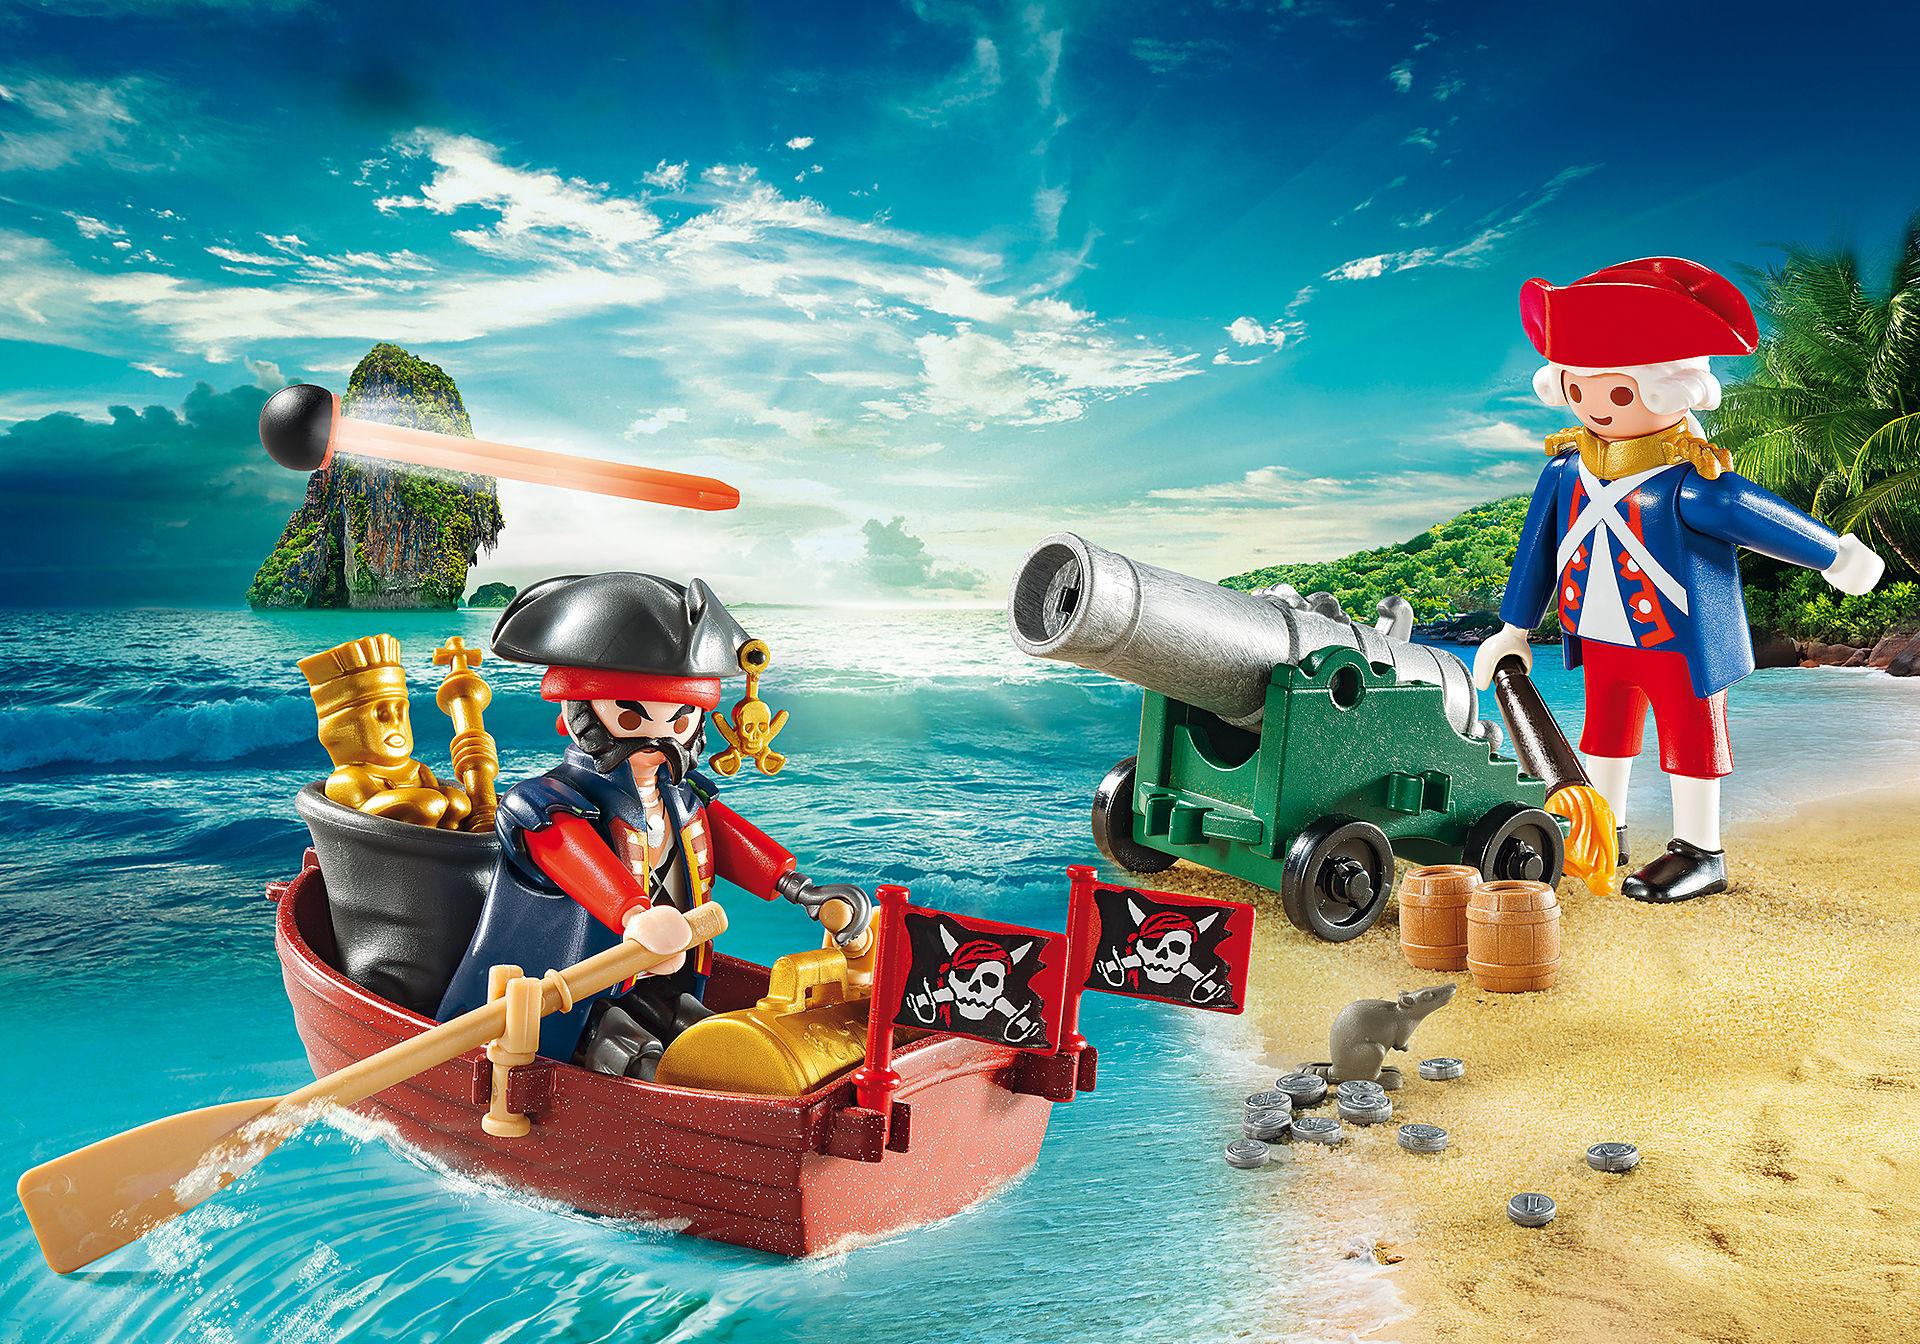 9102 Valisette Pirate et Soldat zoom image1